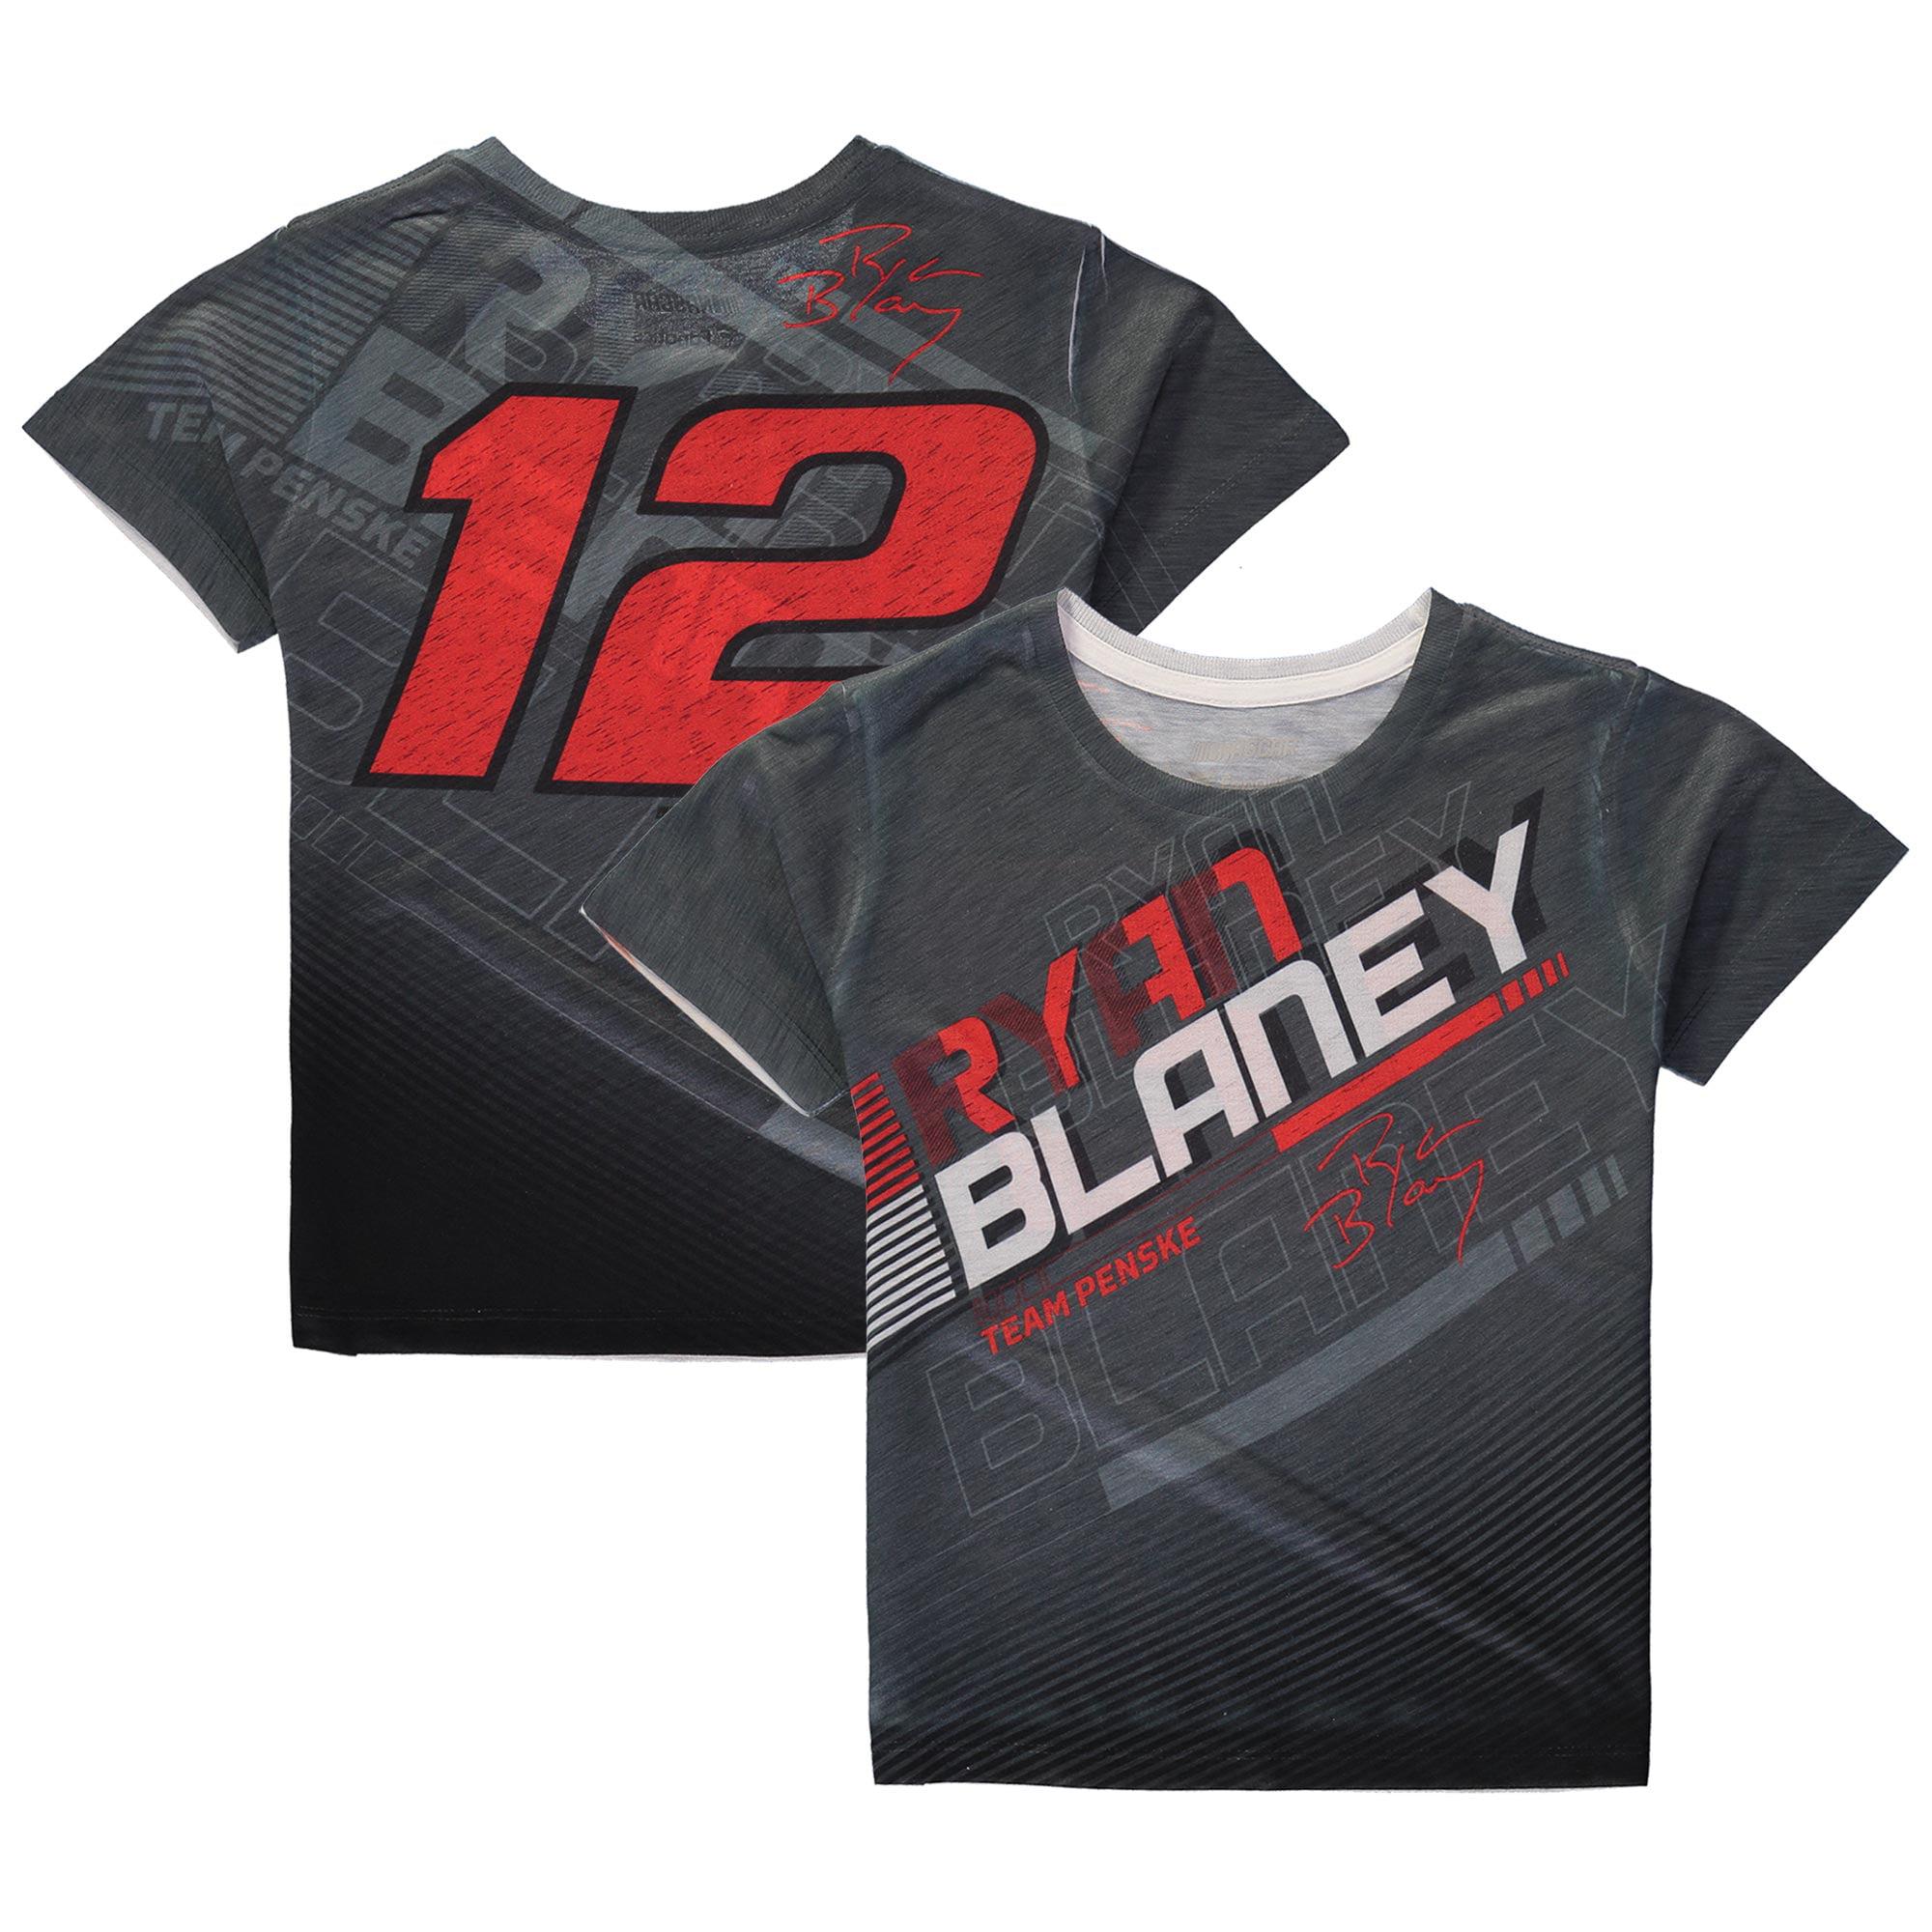 Ryan Blaney Fanatics Branded Youth Asphalt Sublimated T-Shirt - Charcoal